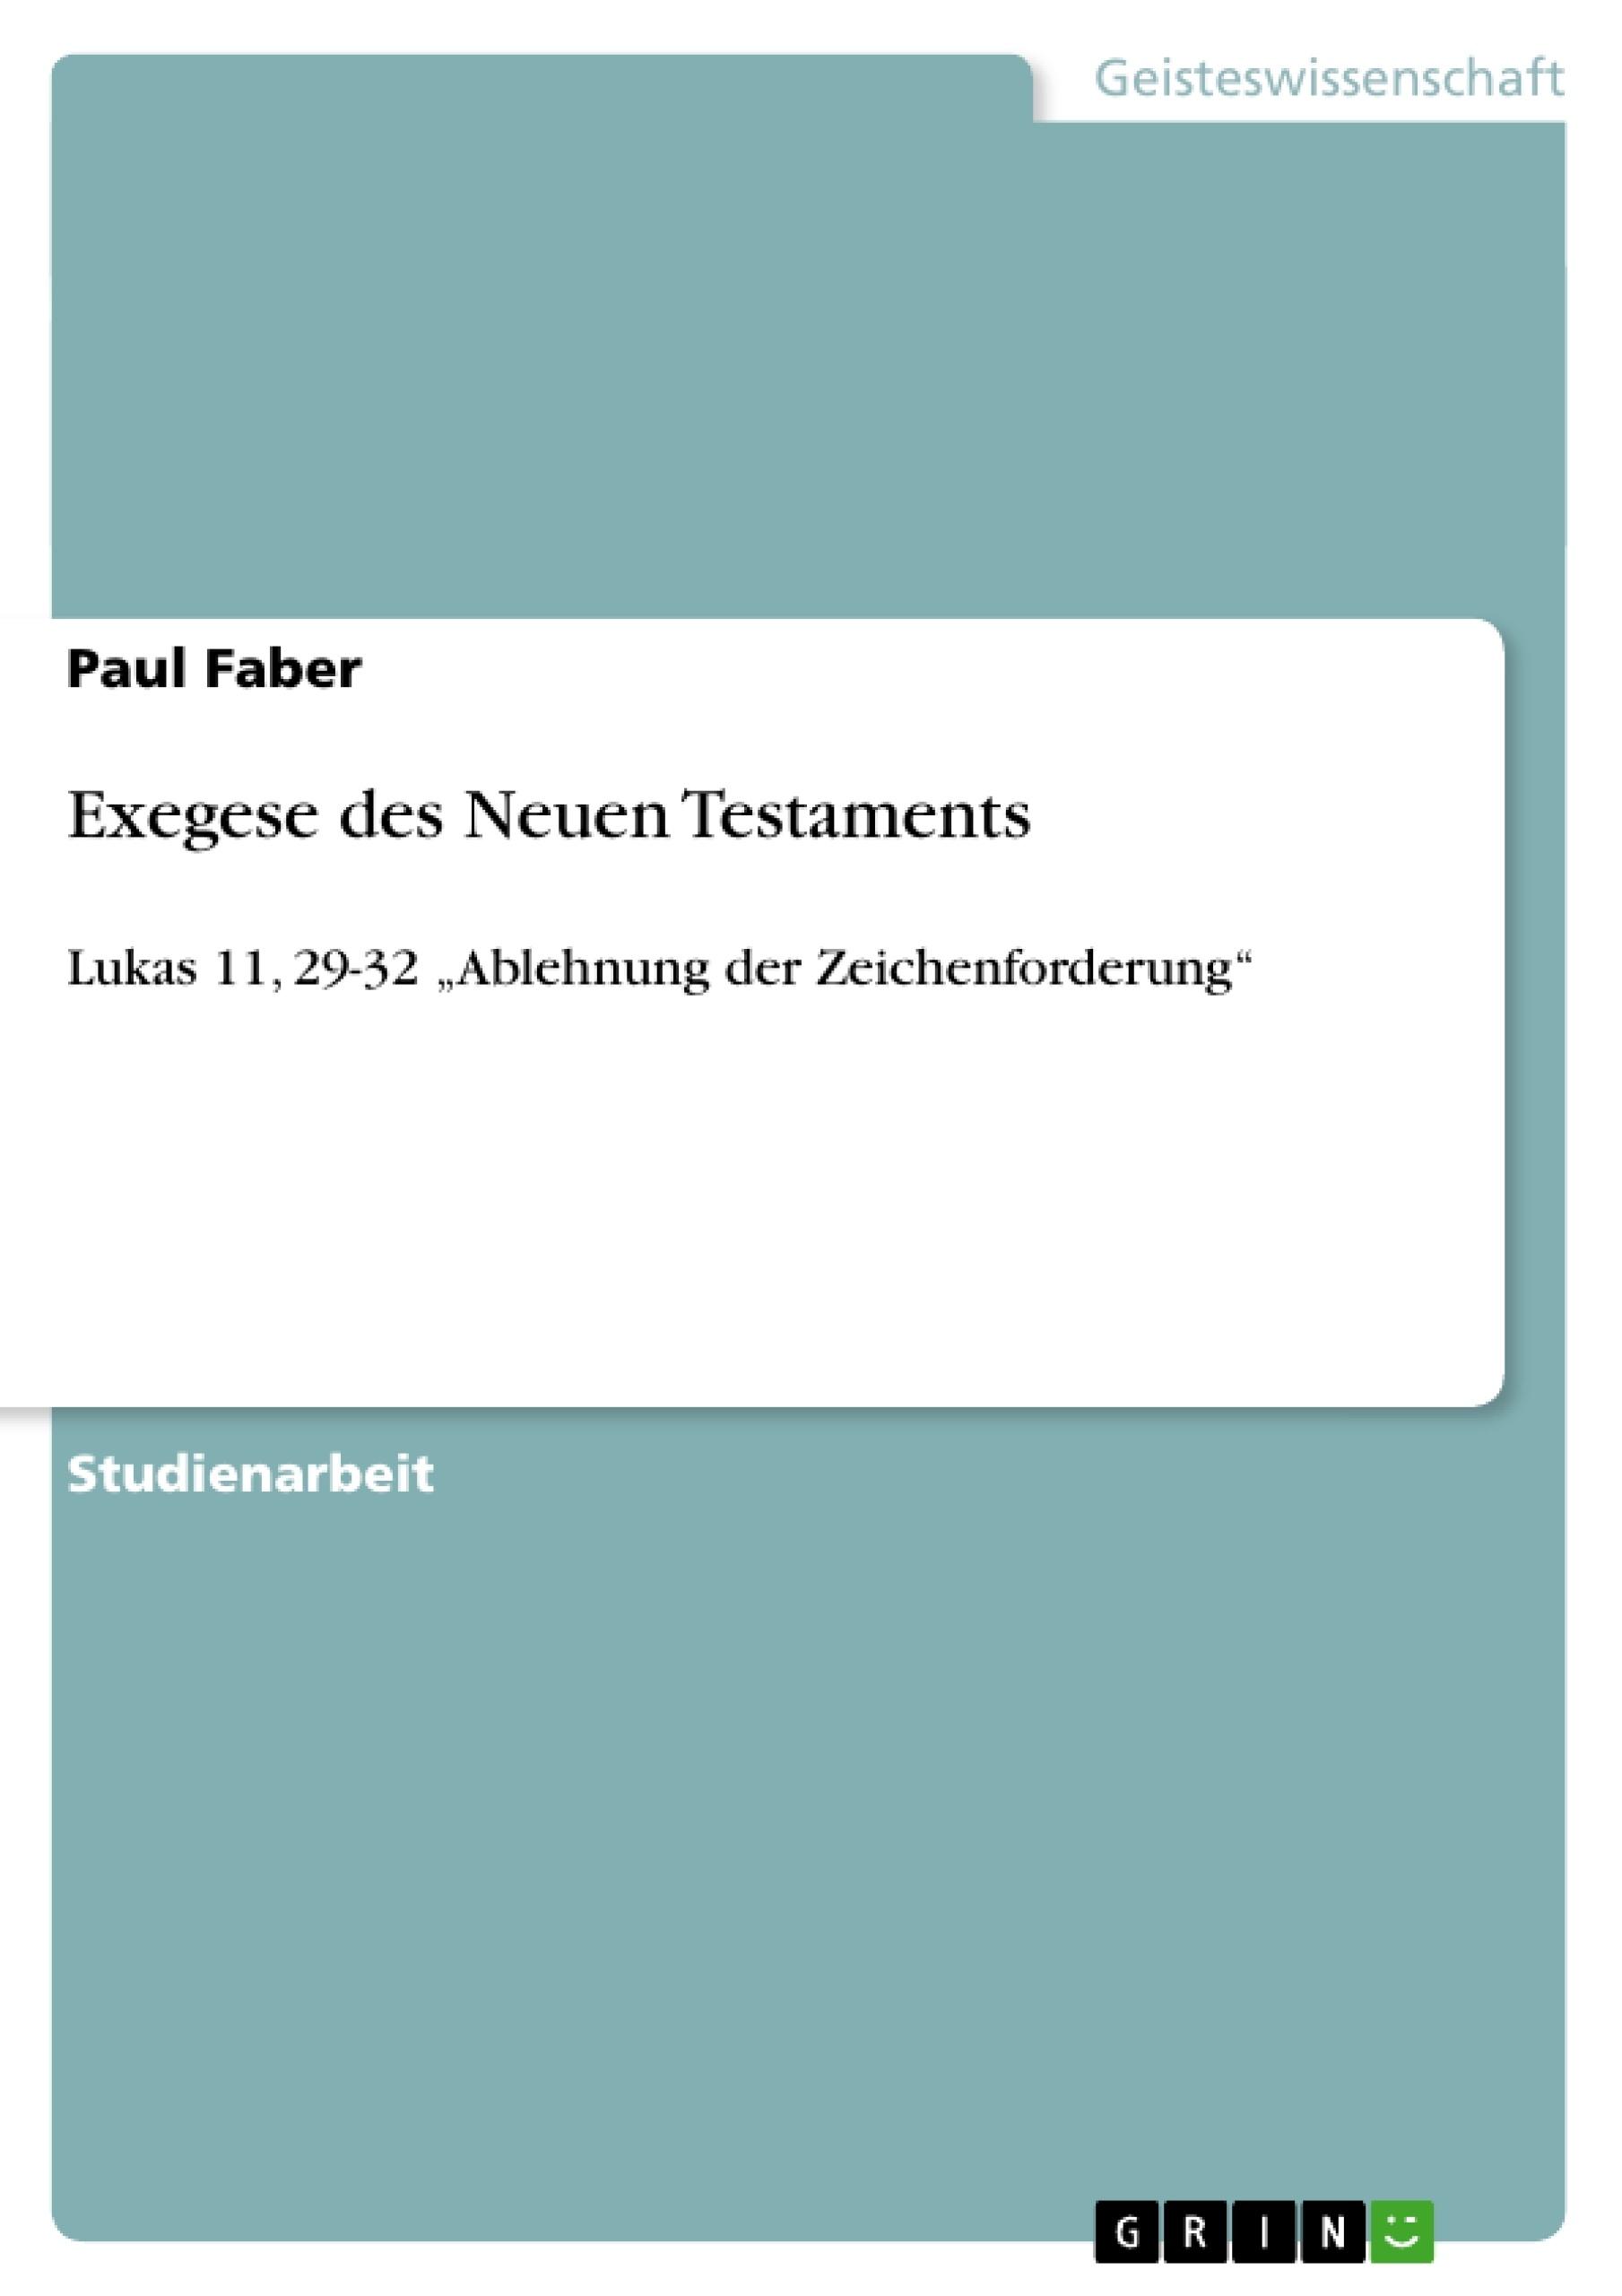 Titel: Exegese des Neuen Testaments